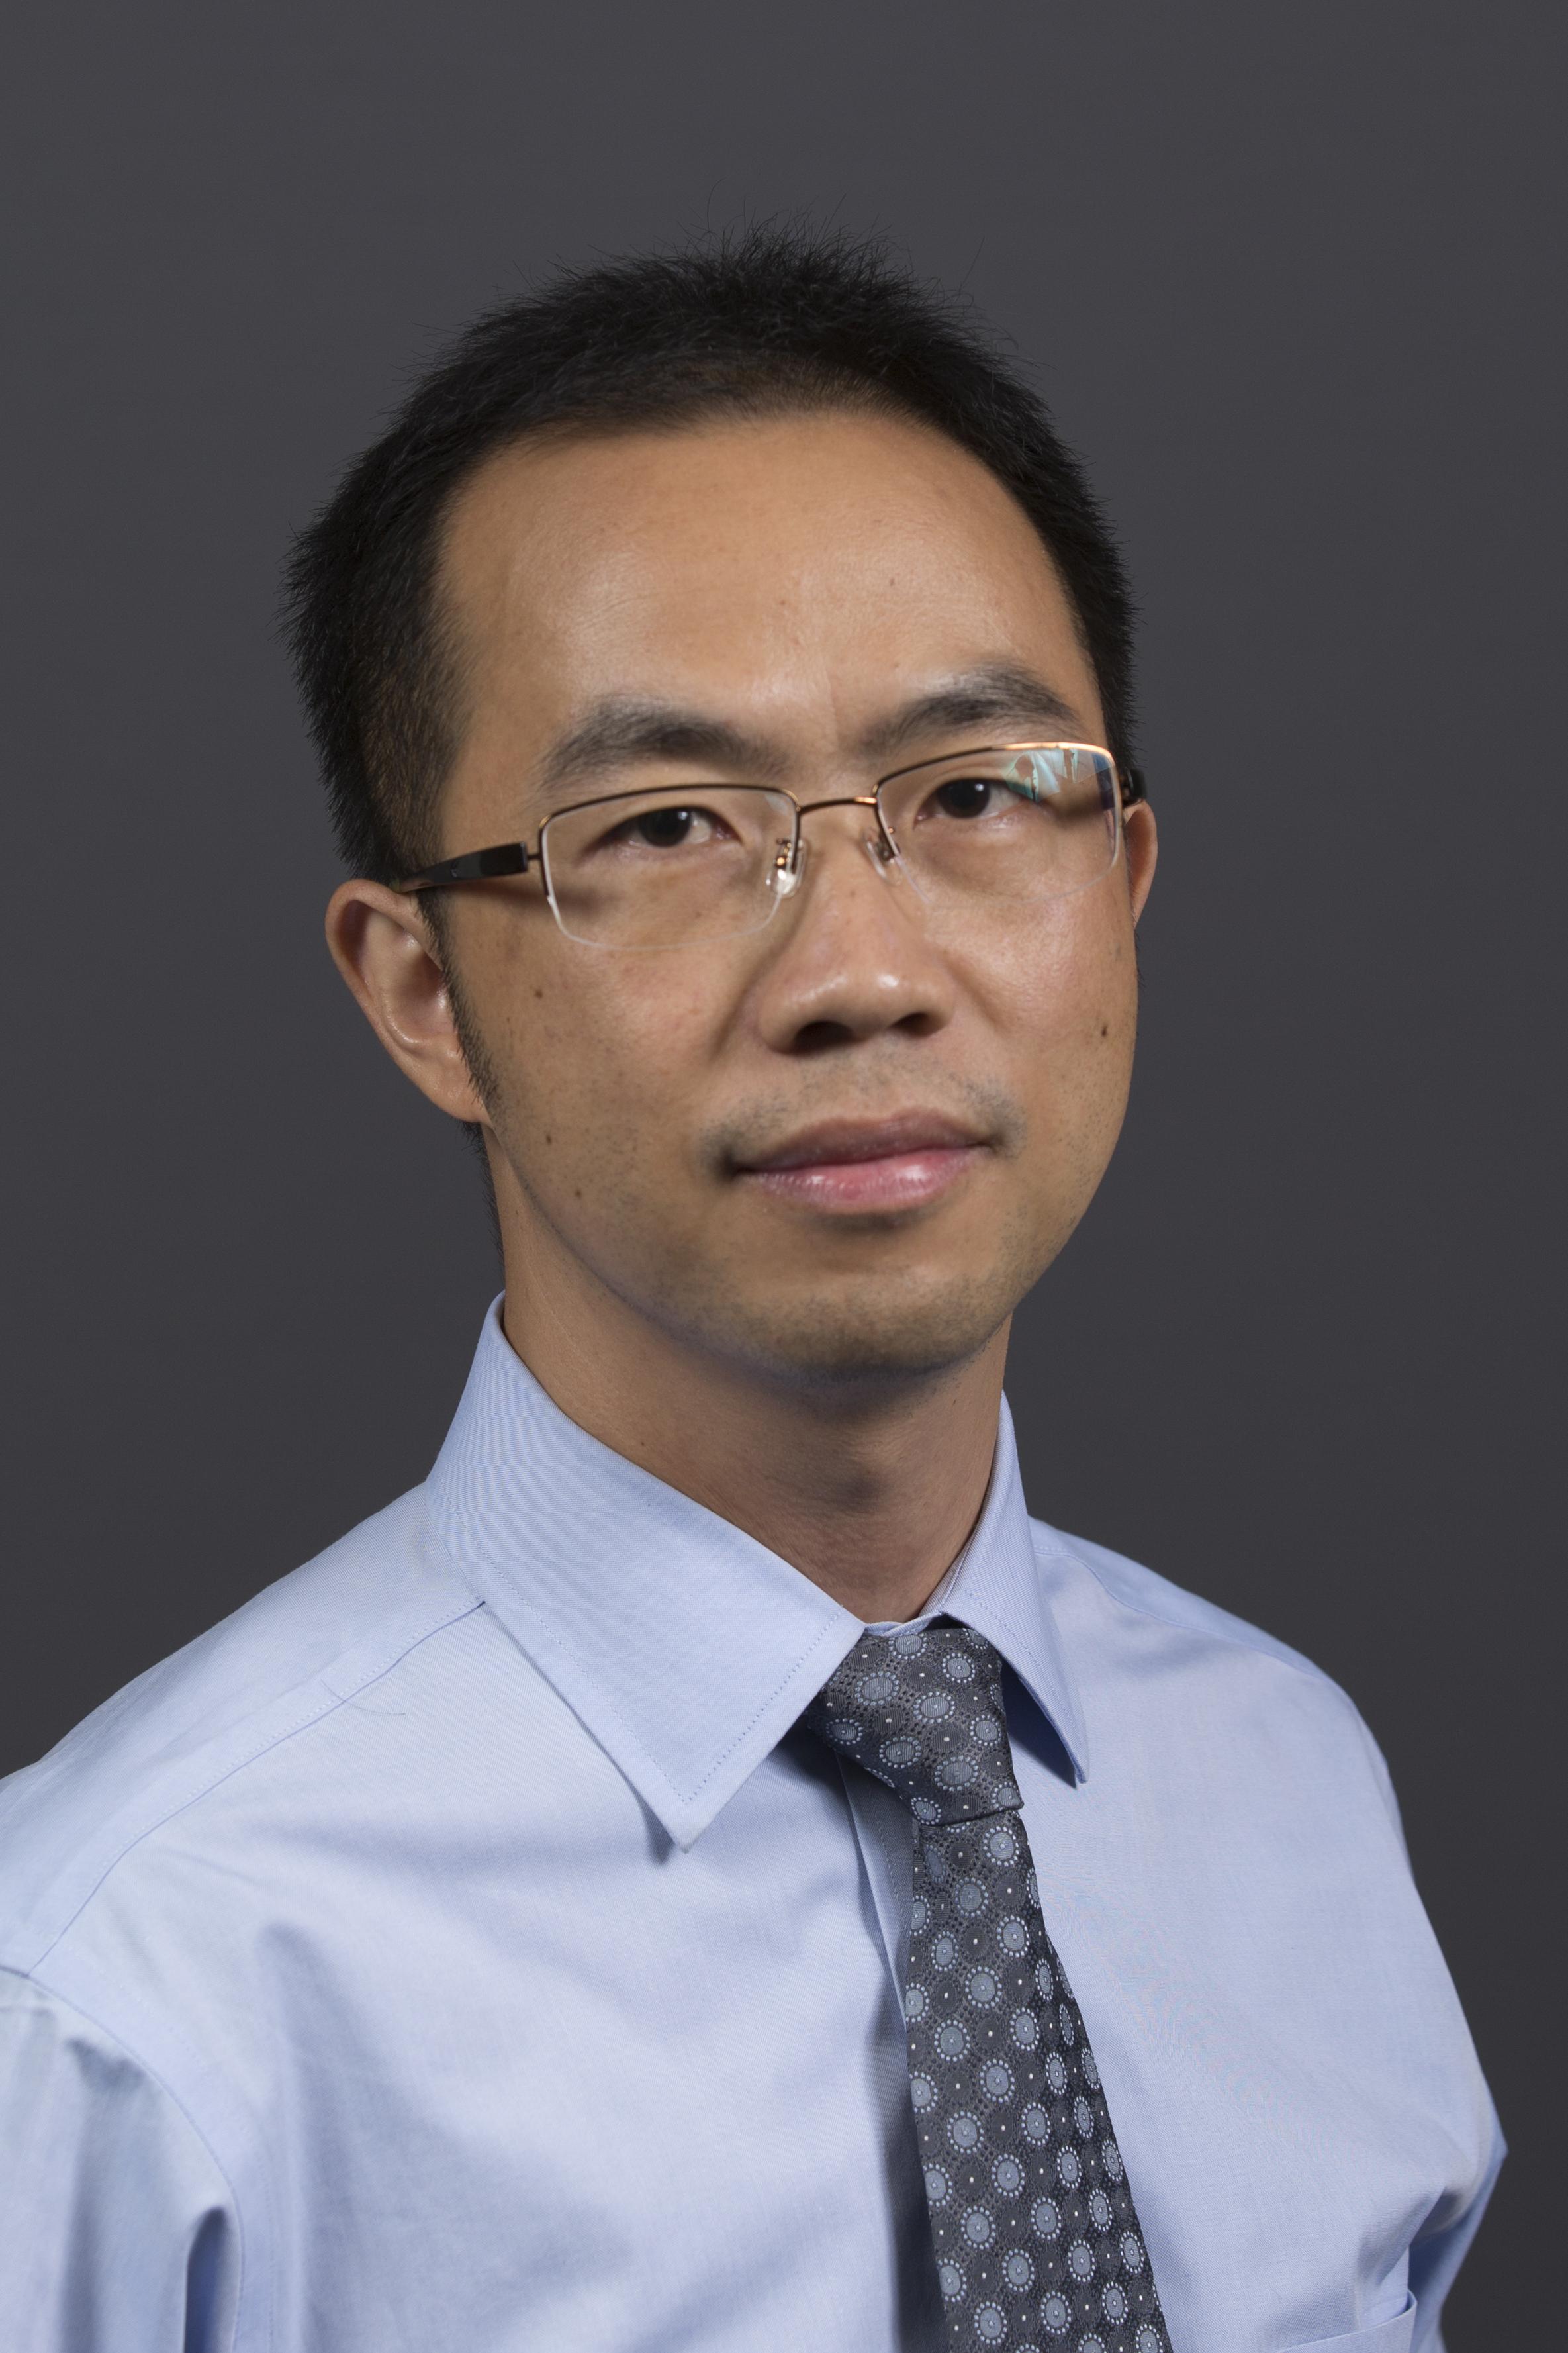 Visit Profile of Langtao Chen